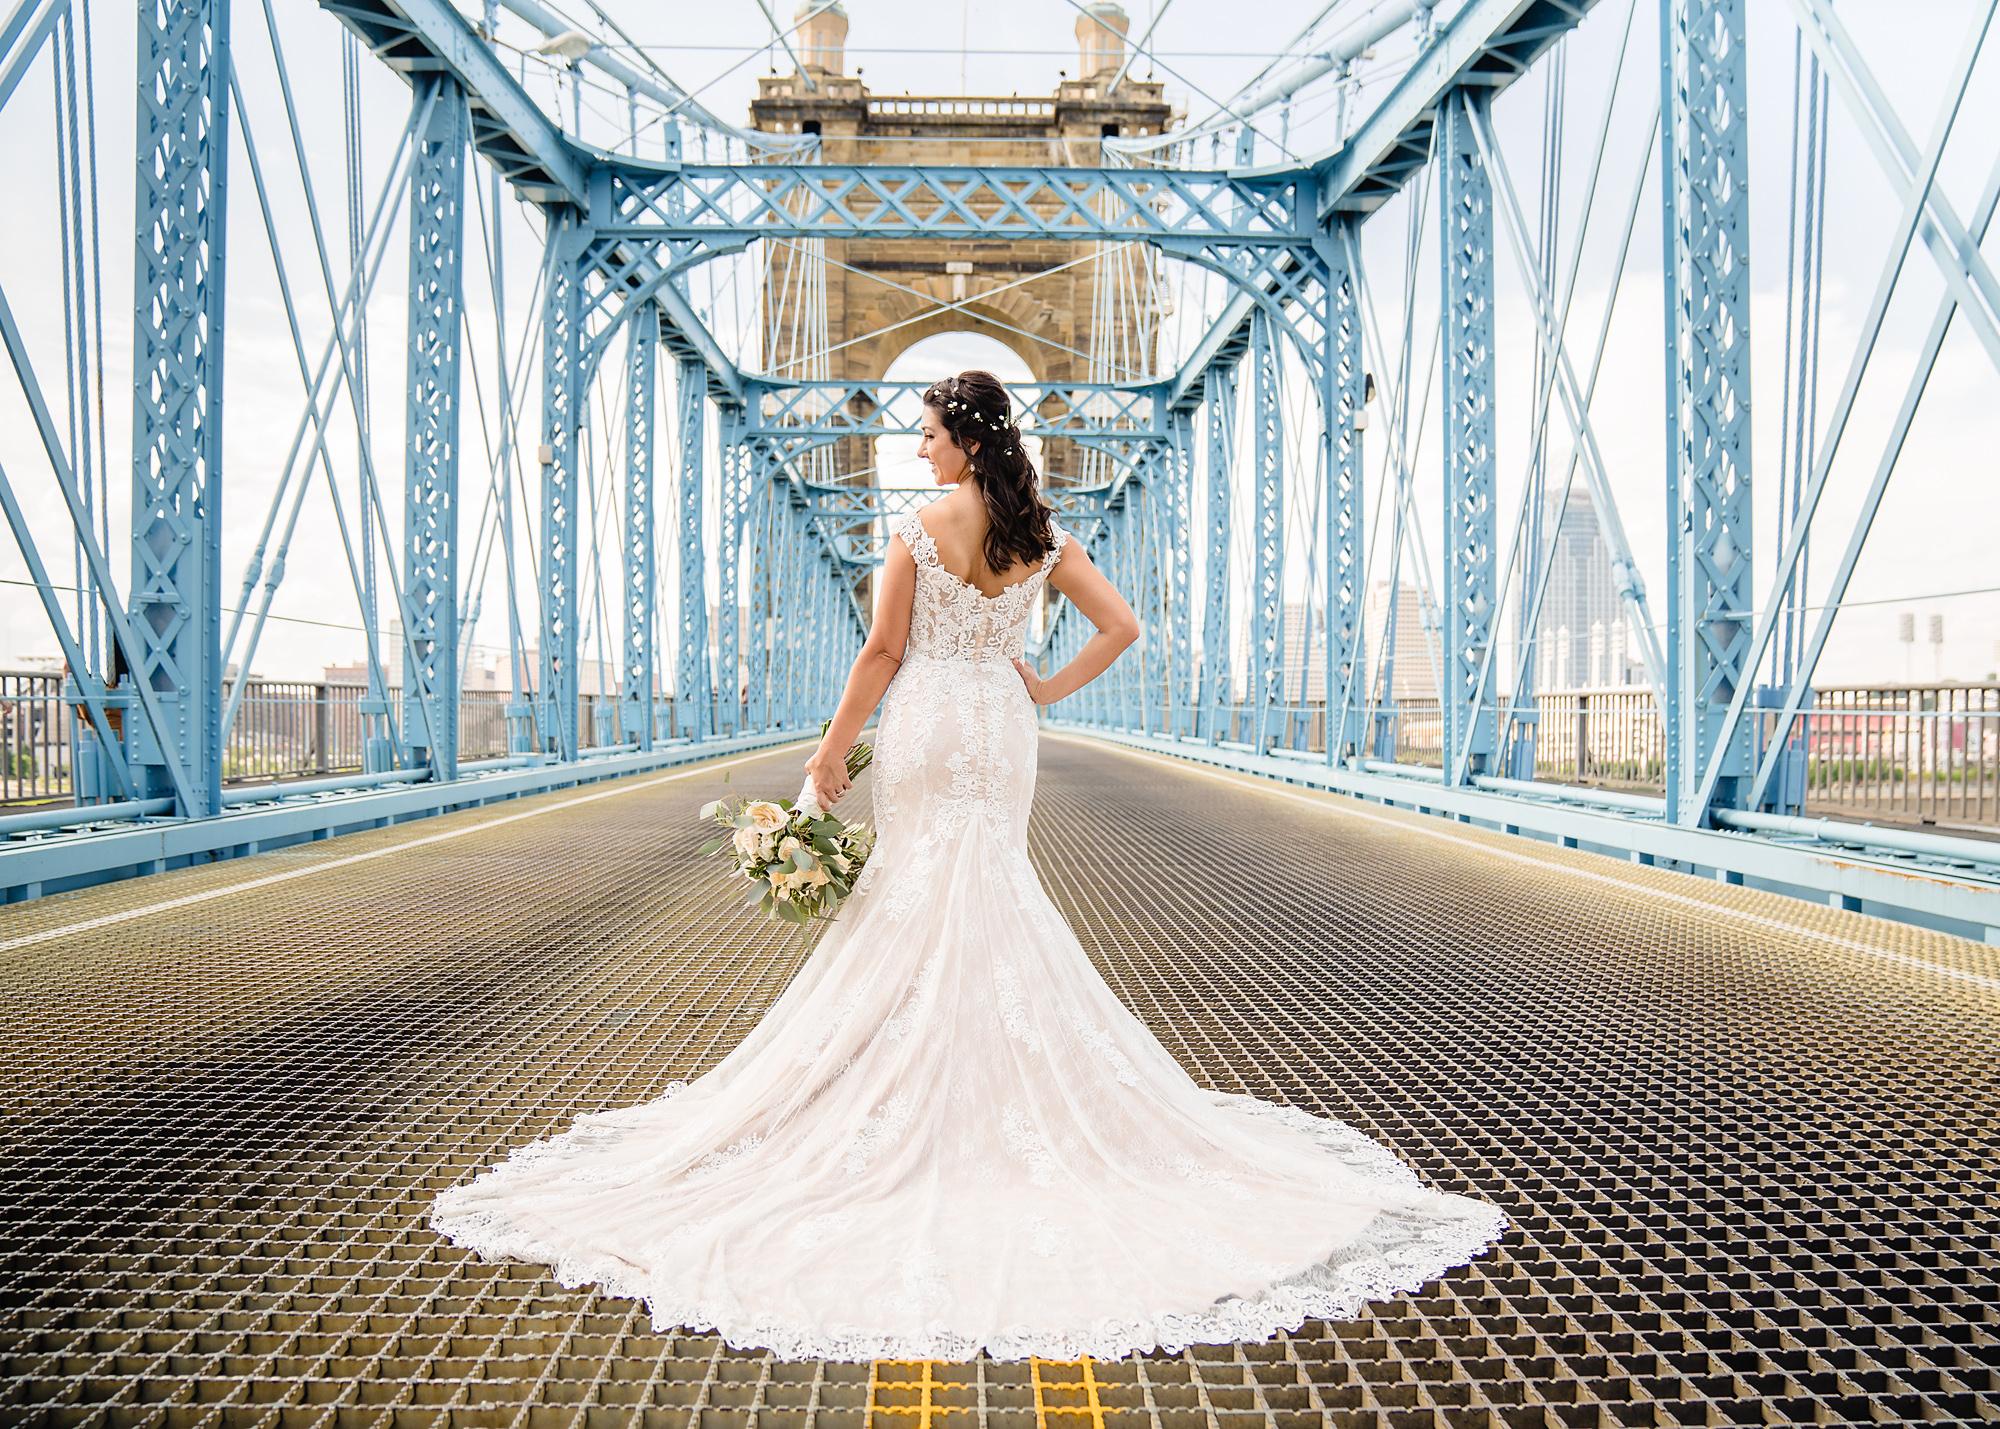 Embassy-Suites-Rivercenter-Wedding-Photography-16.jpg